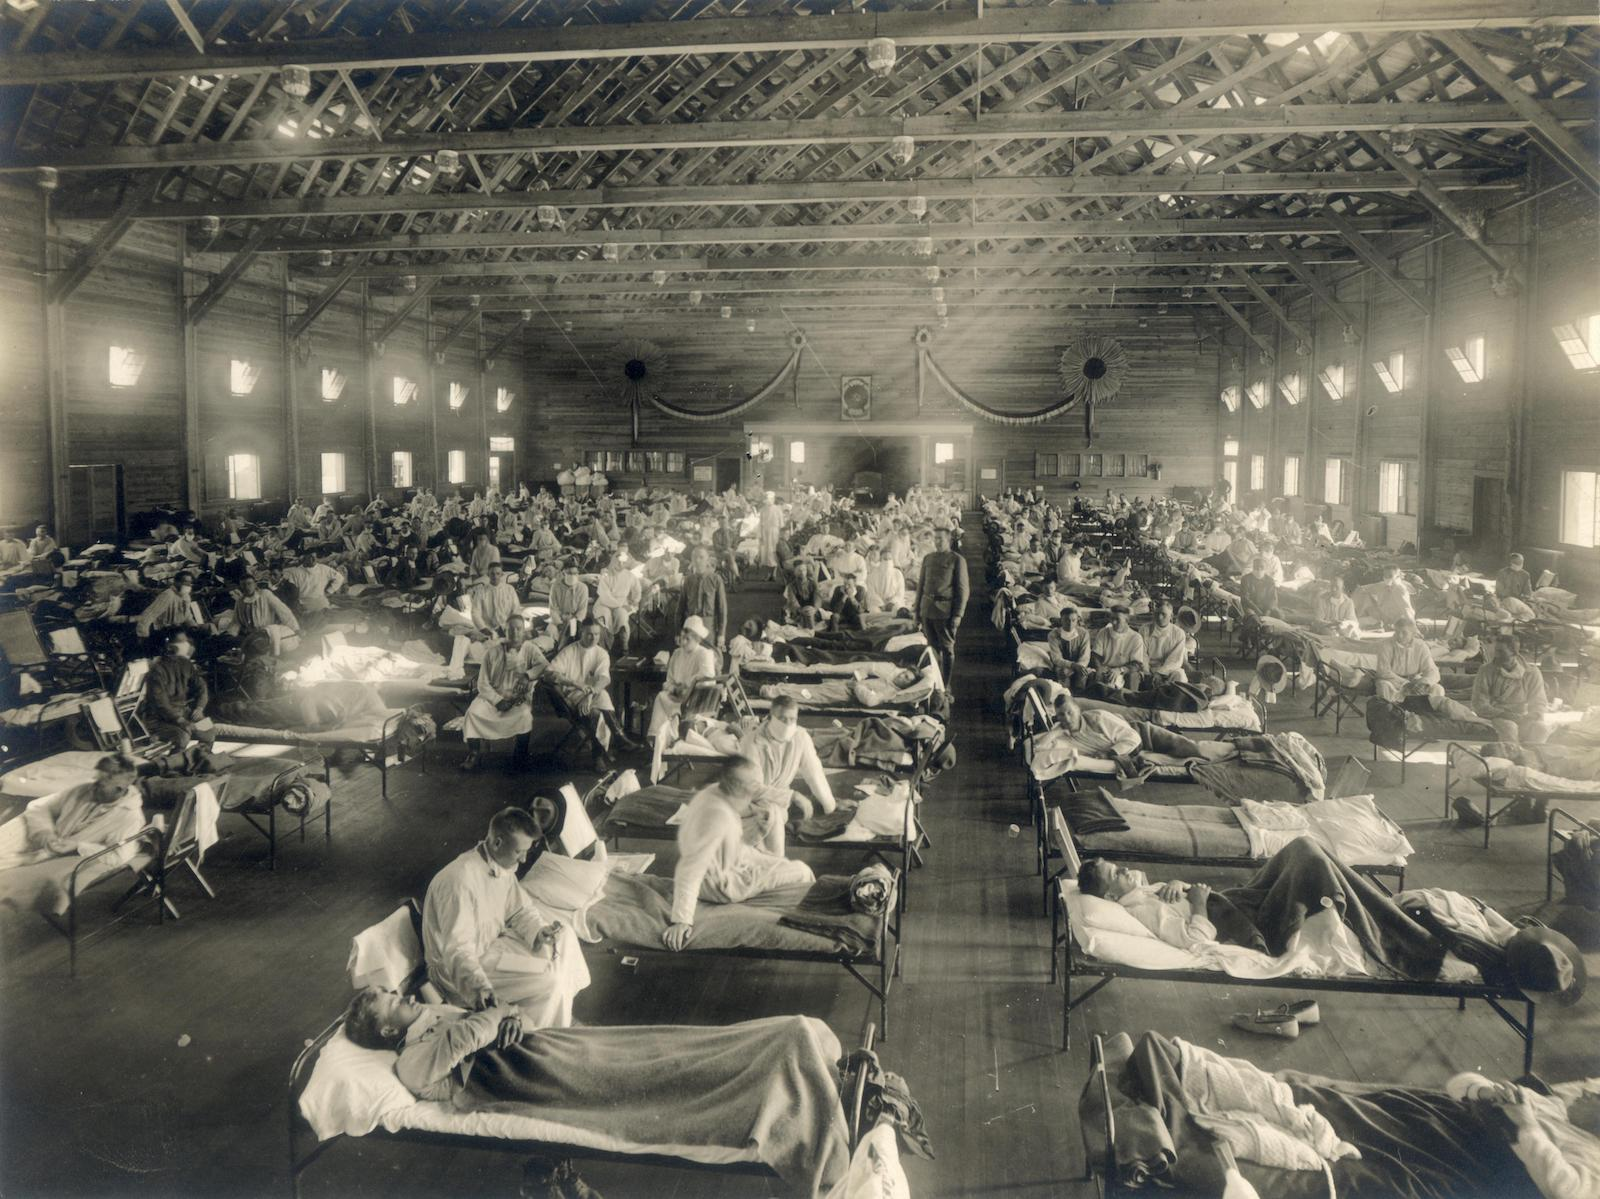 Spanish Flue Camp Funston Kansas Emergency Hospital